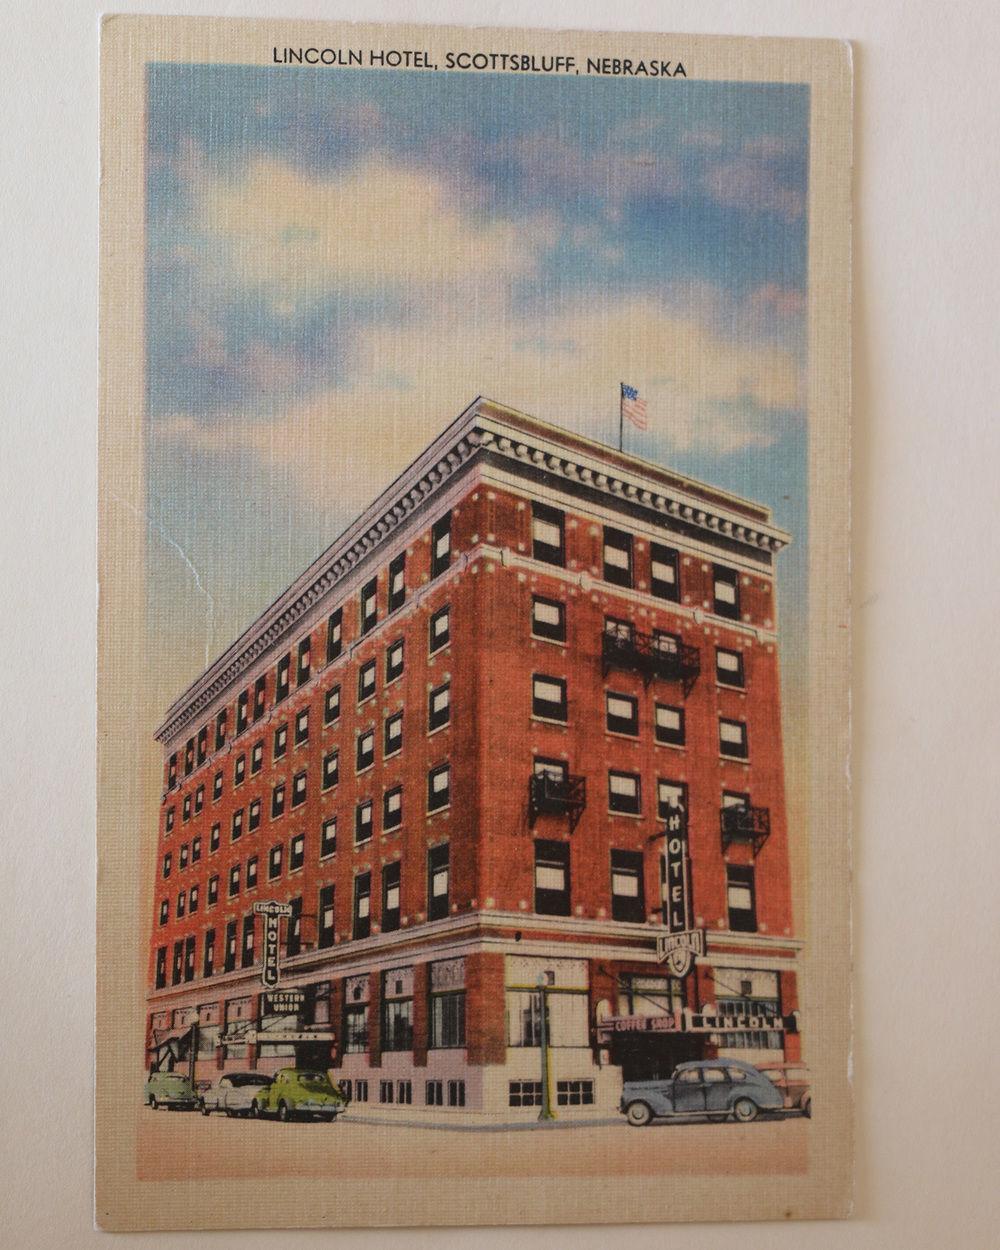 Suites In Lincoln Ne: Scottsbluff's Lincoln Hotel Turns 100